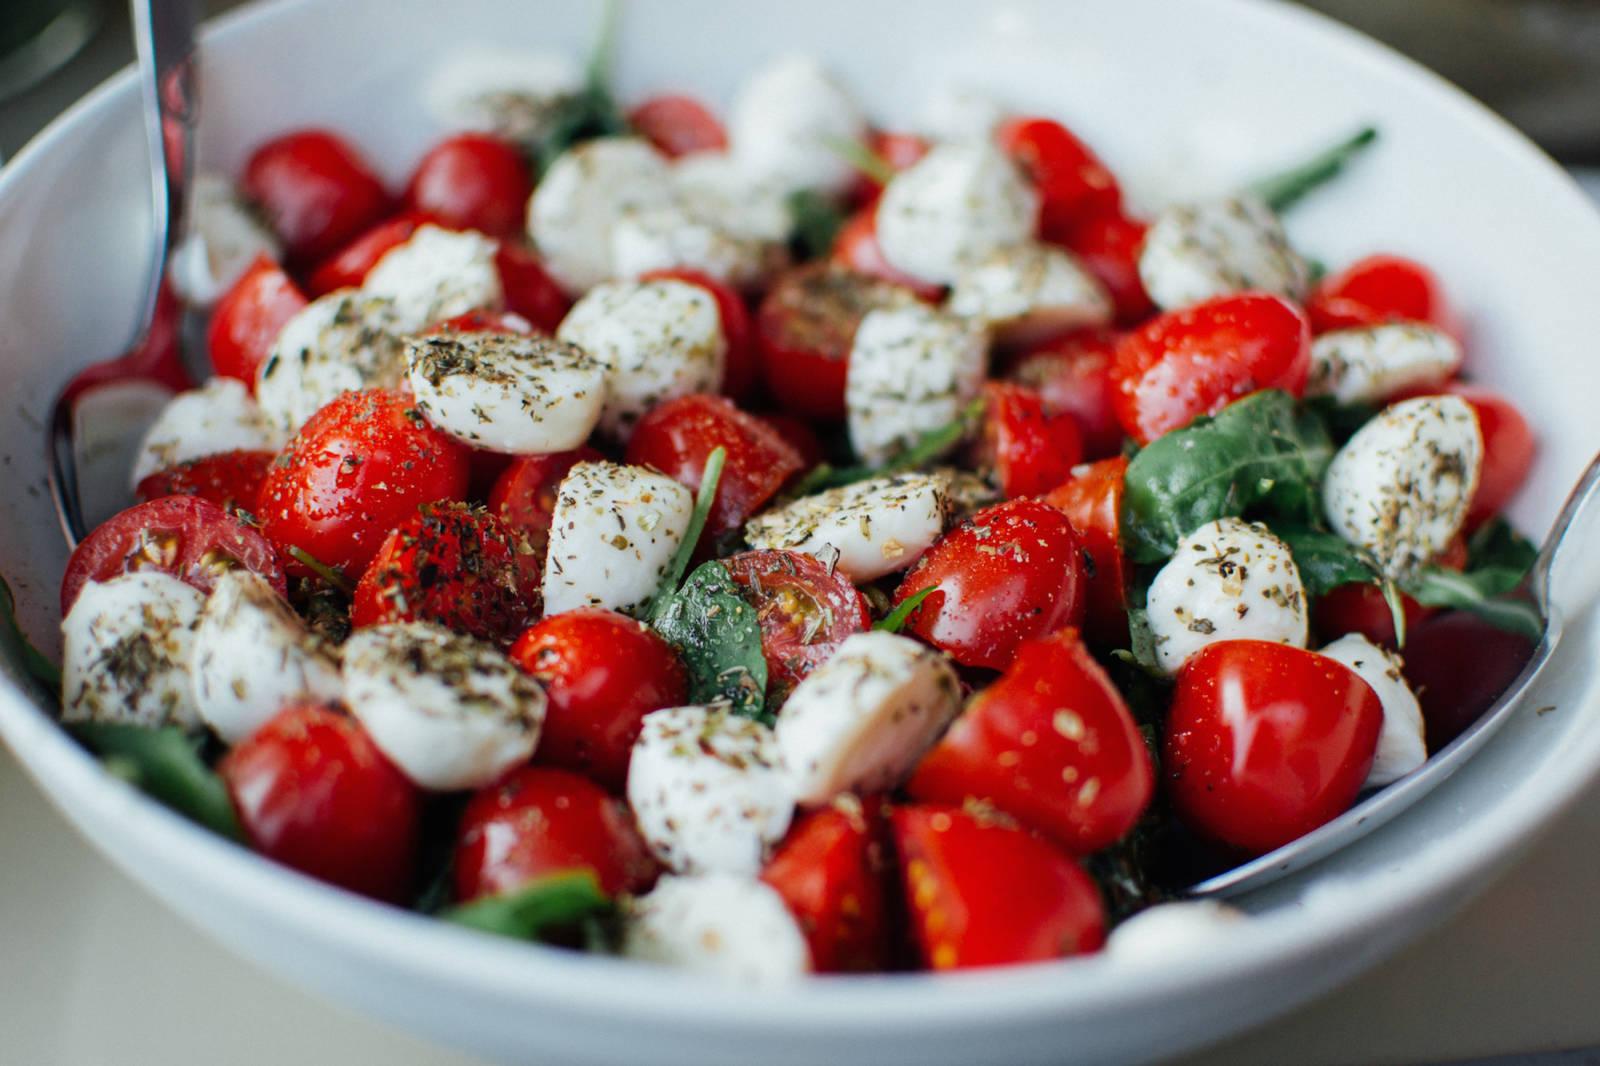 Italiand food